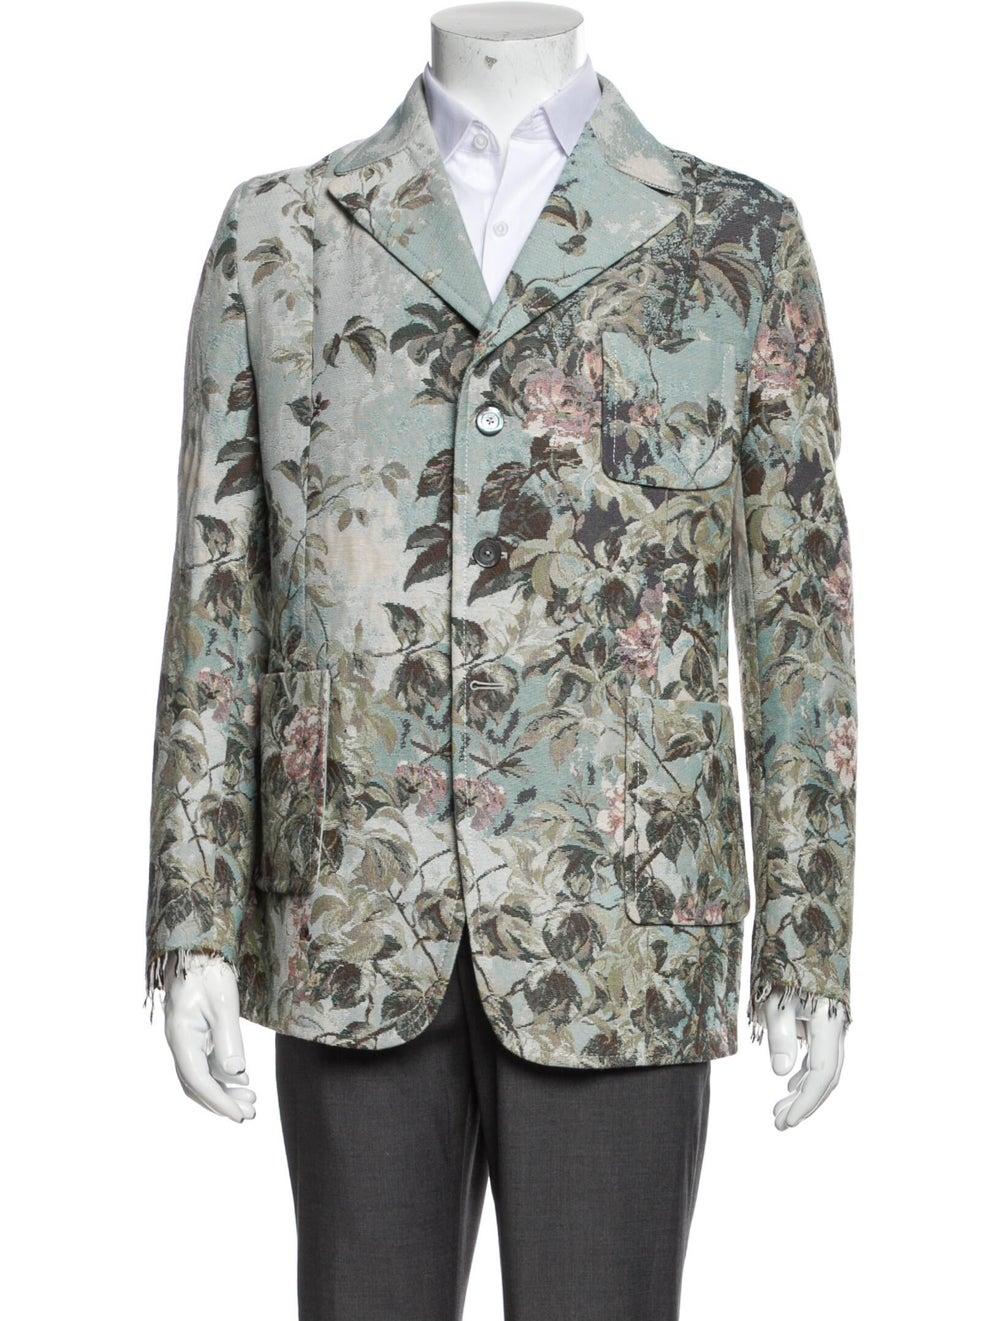 Gucci Floral Print Blazer w/ Tags Blue - image 1